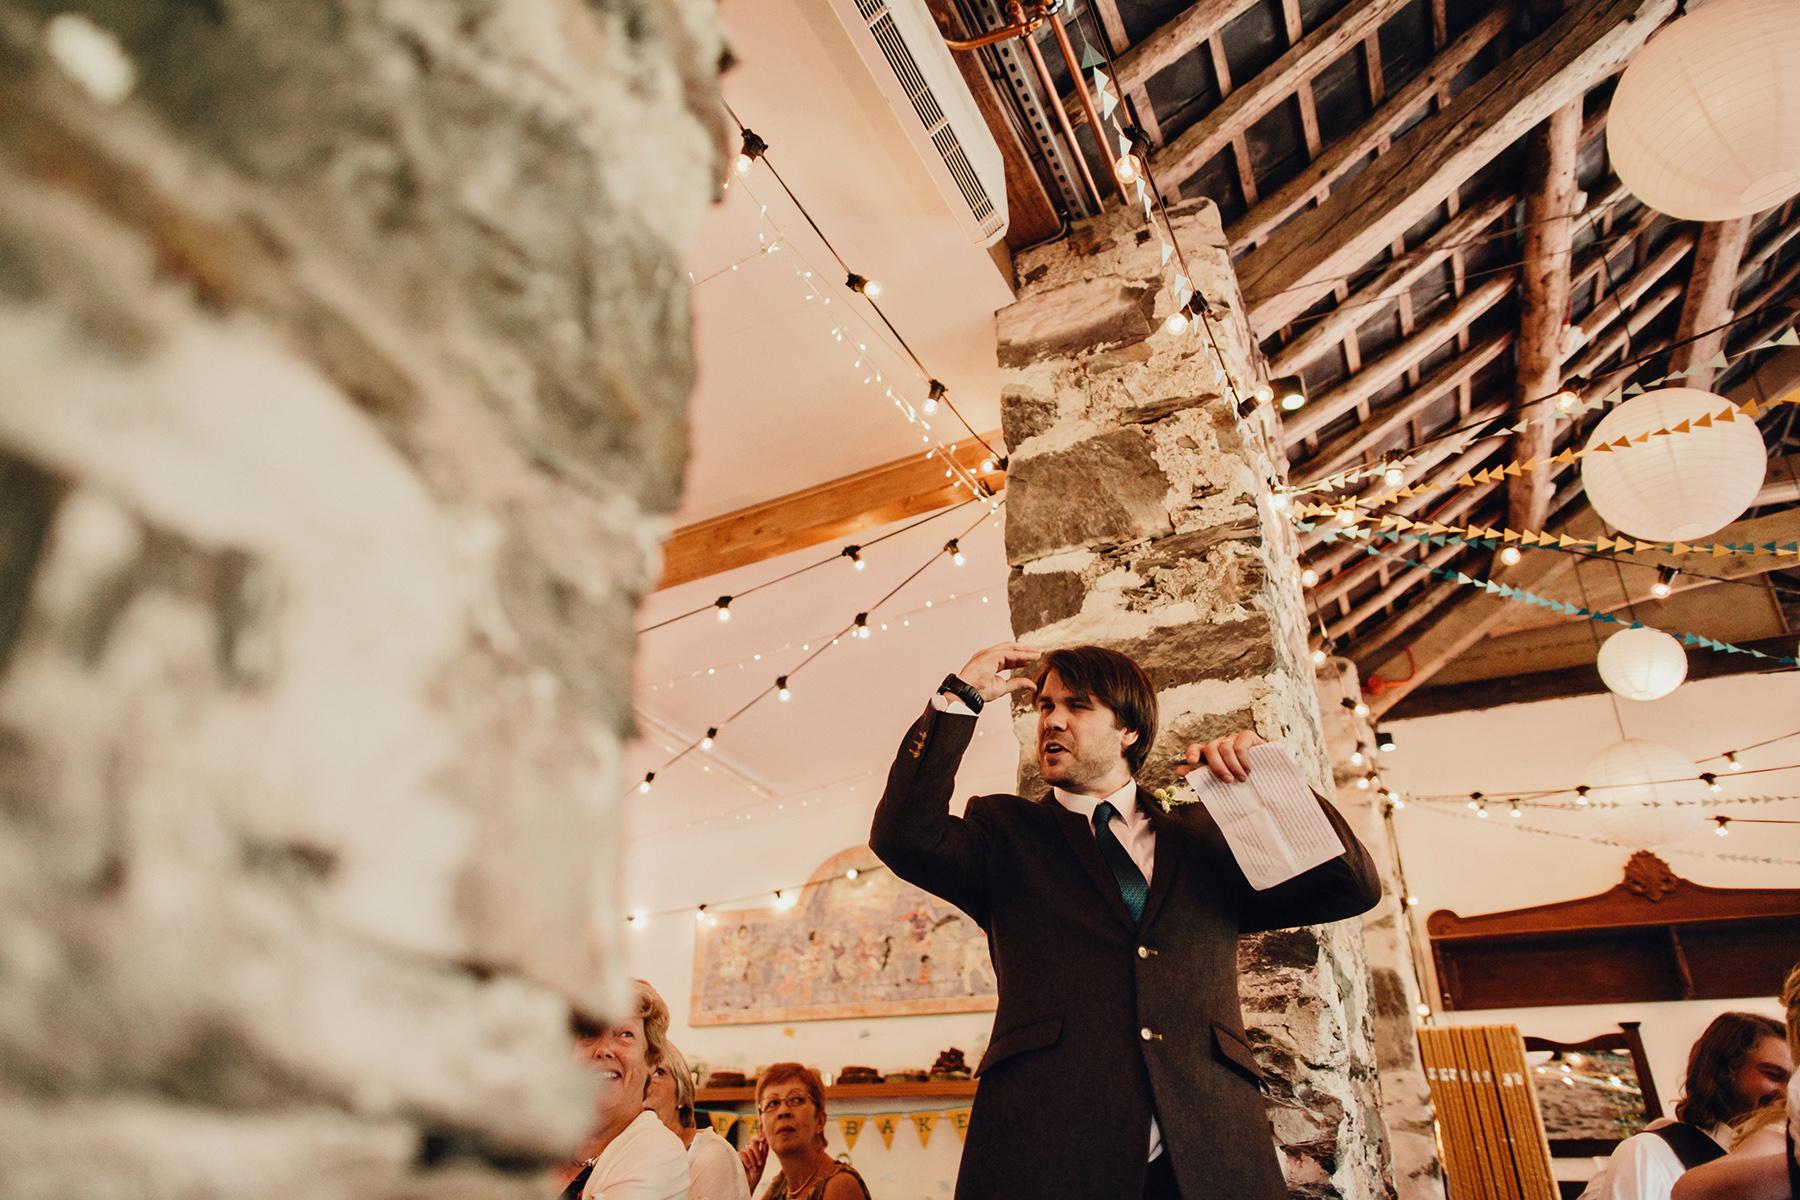 Snowdonia-Wales-Wedding-Photos-0390.jpg